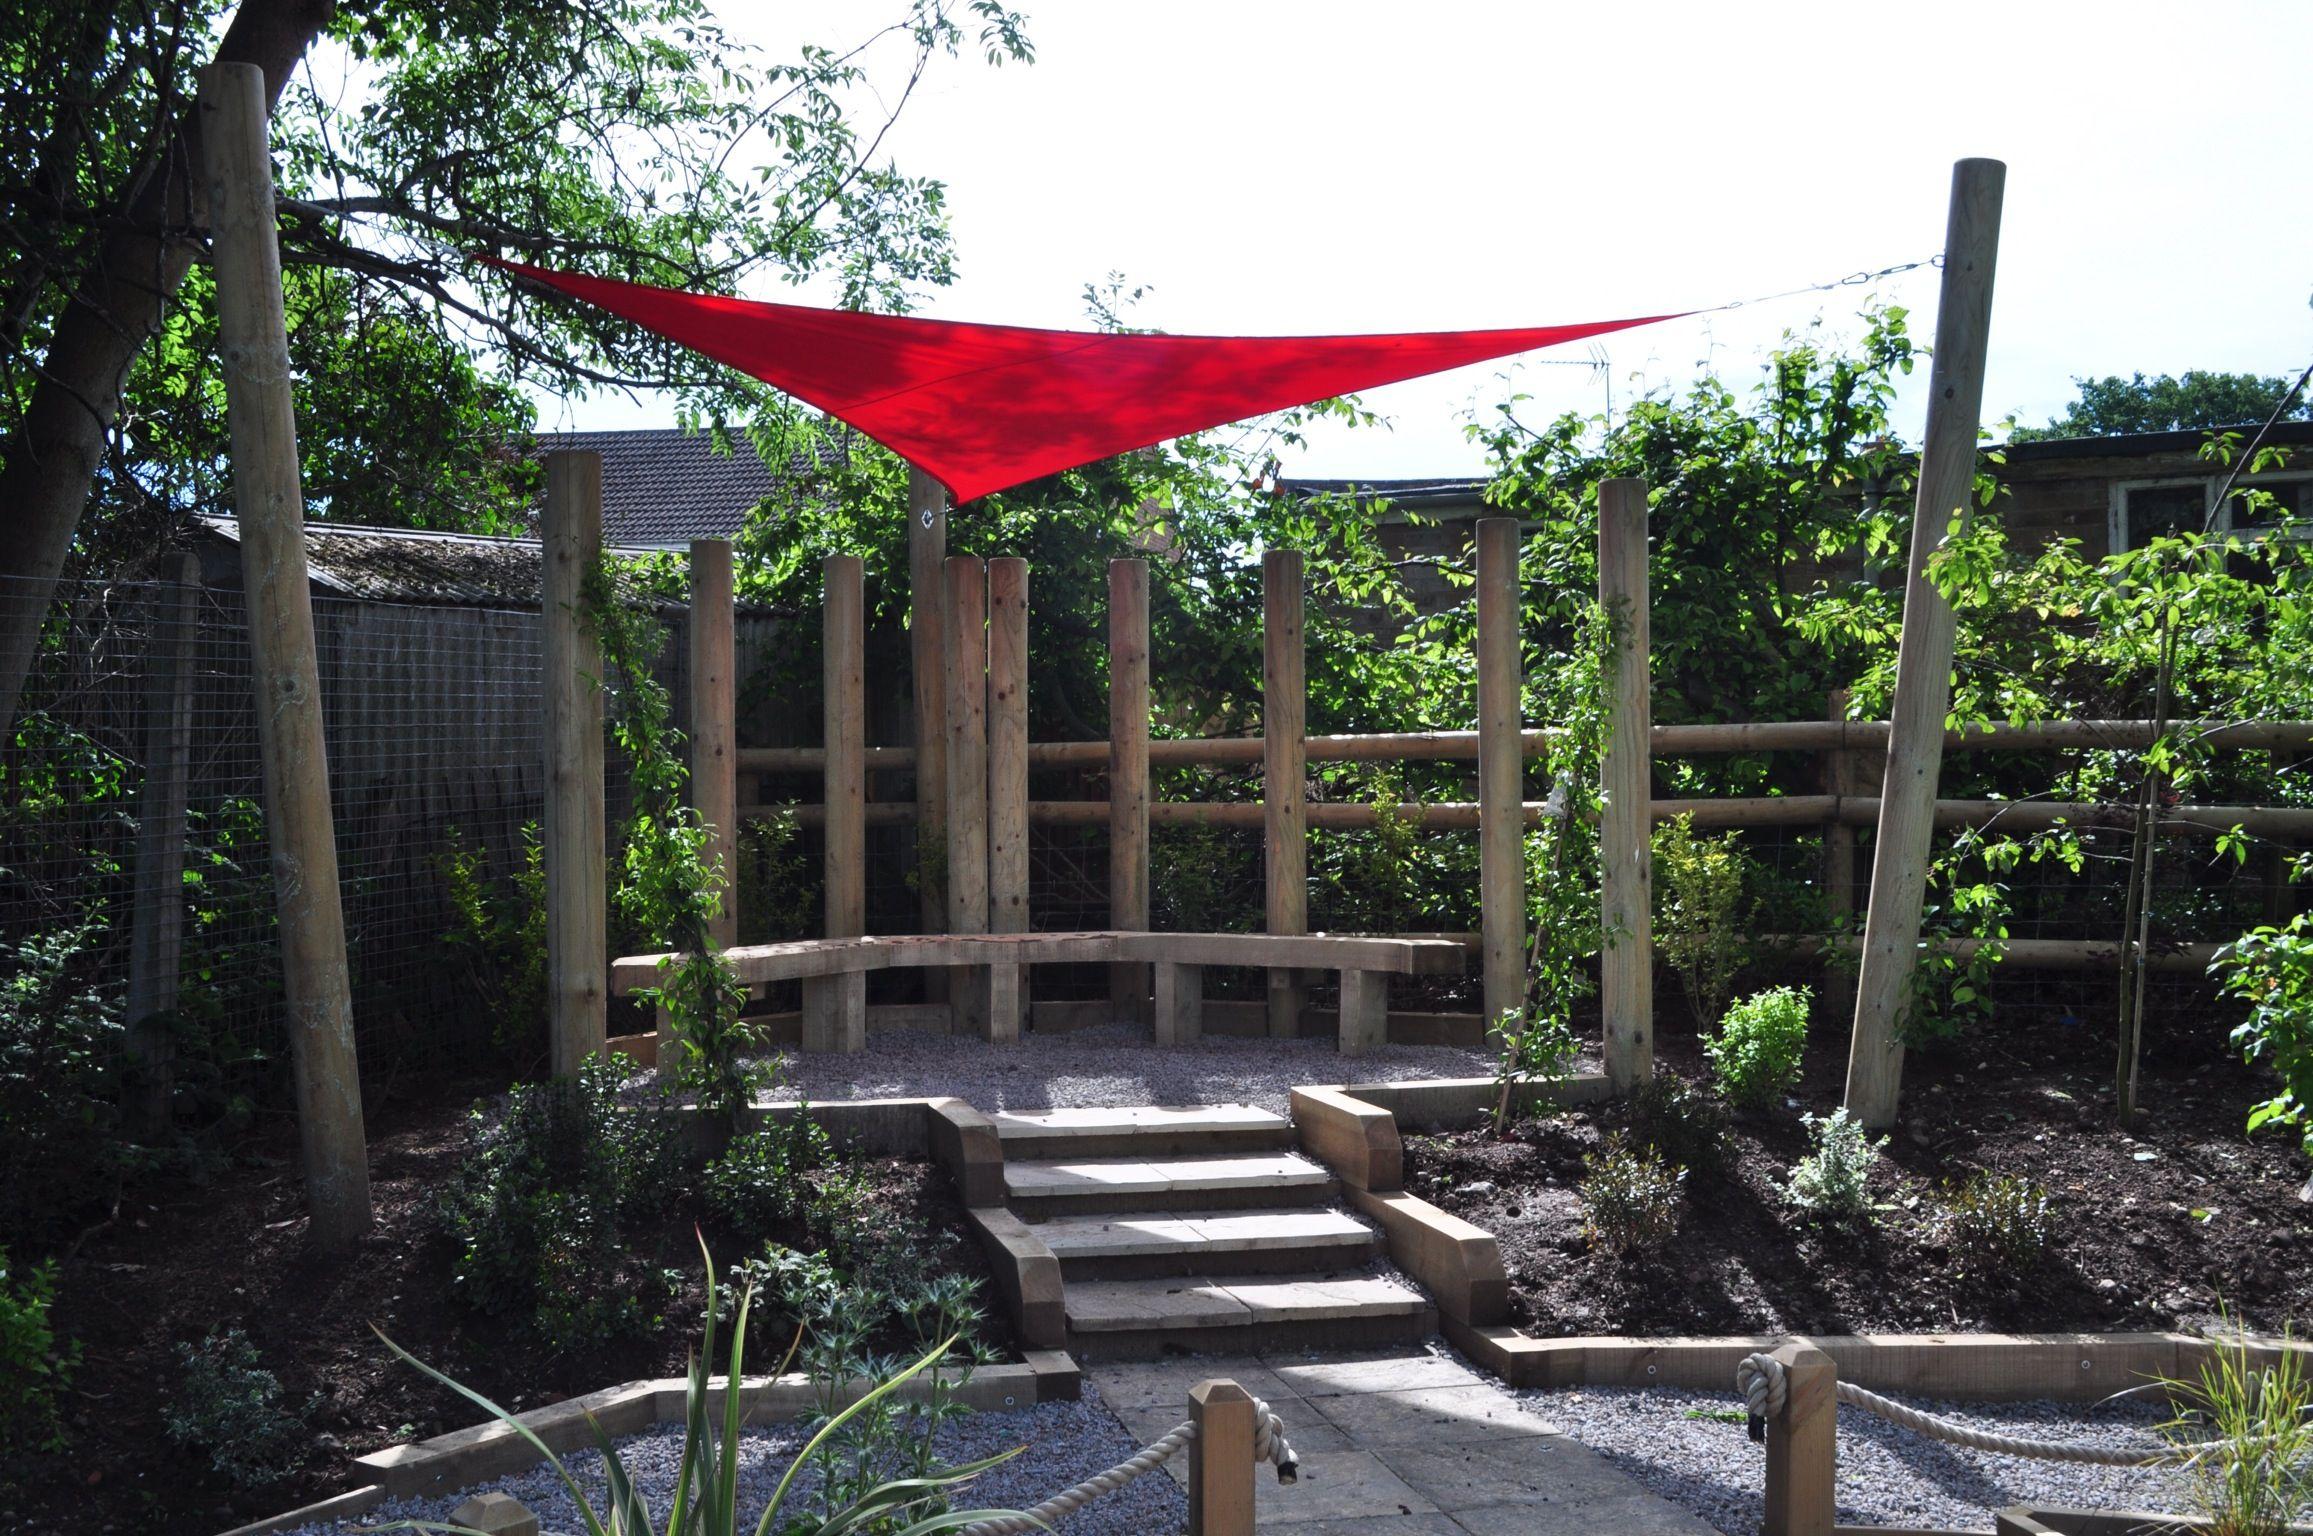 Learning Pod For Web Heath School Redditch By Jill Dempsey Garden Design And The Garden Project School Garden Garden Projects Garden Design